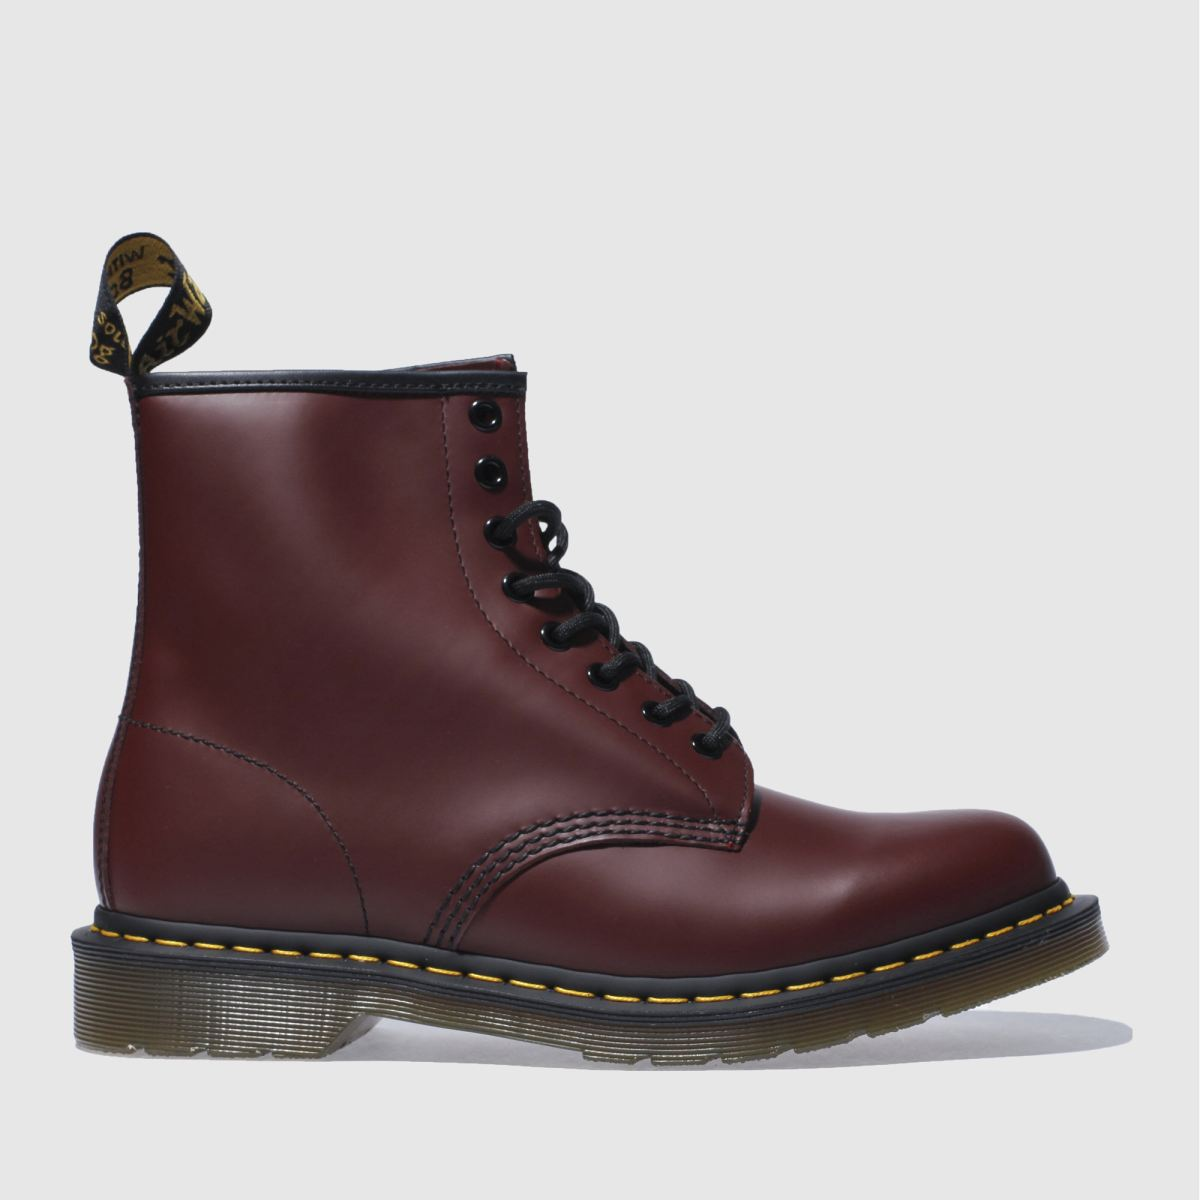 dr martens burgundy 8 tie boots